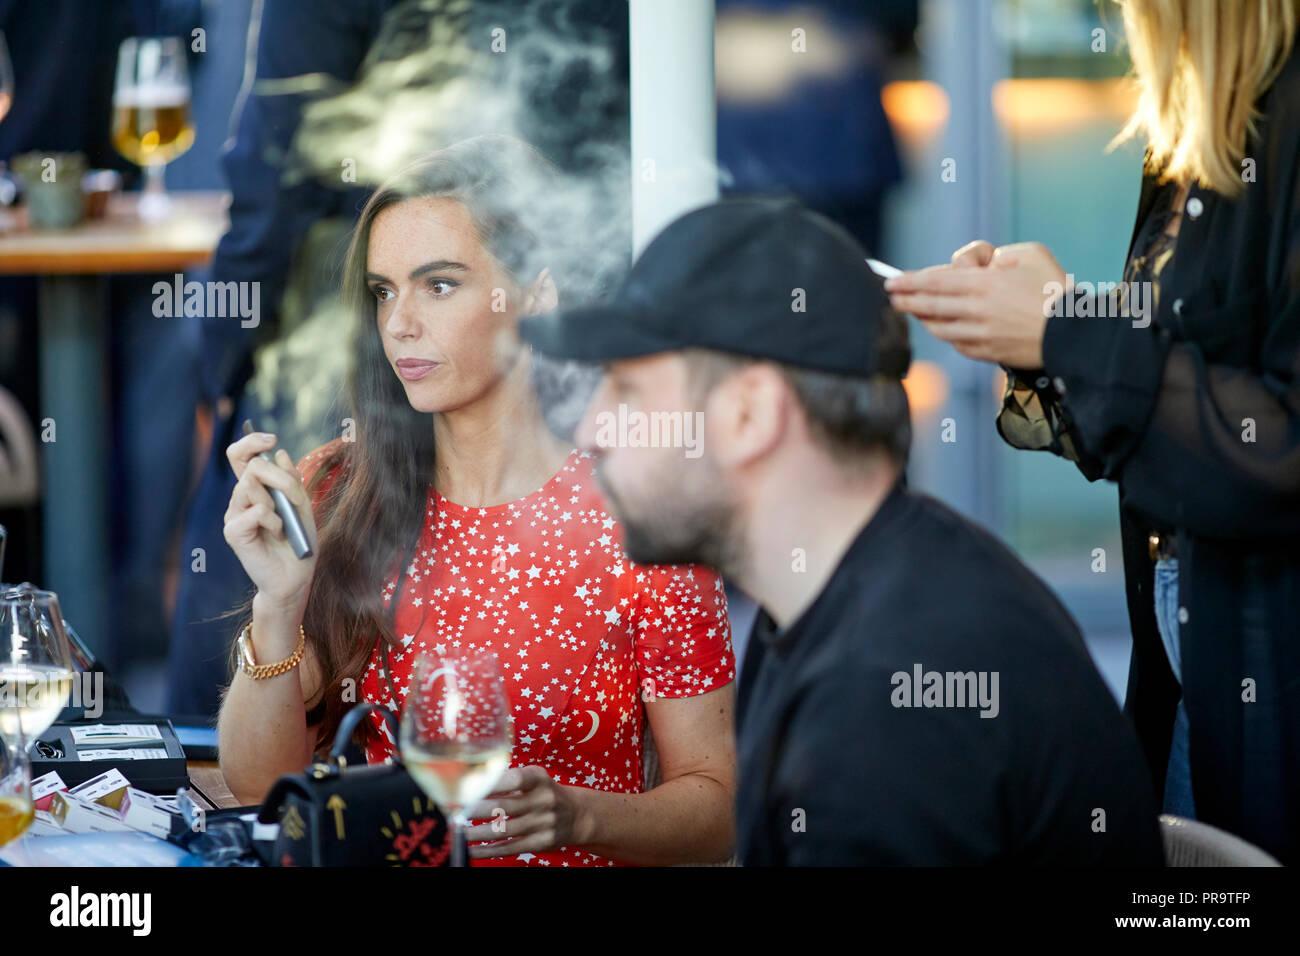 celebrity actress Jennifer  Metcalfe  smoking using vape happing pens in Manchester - Stock Image